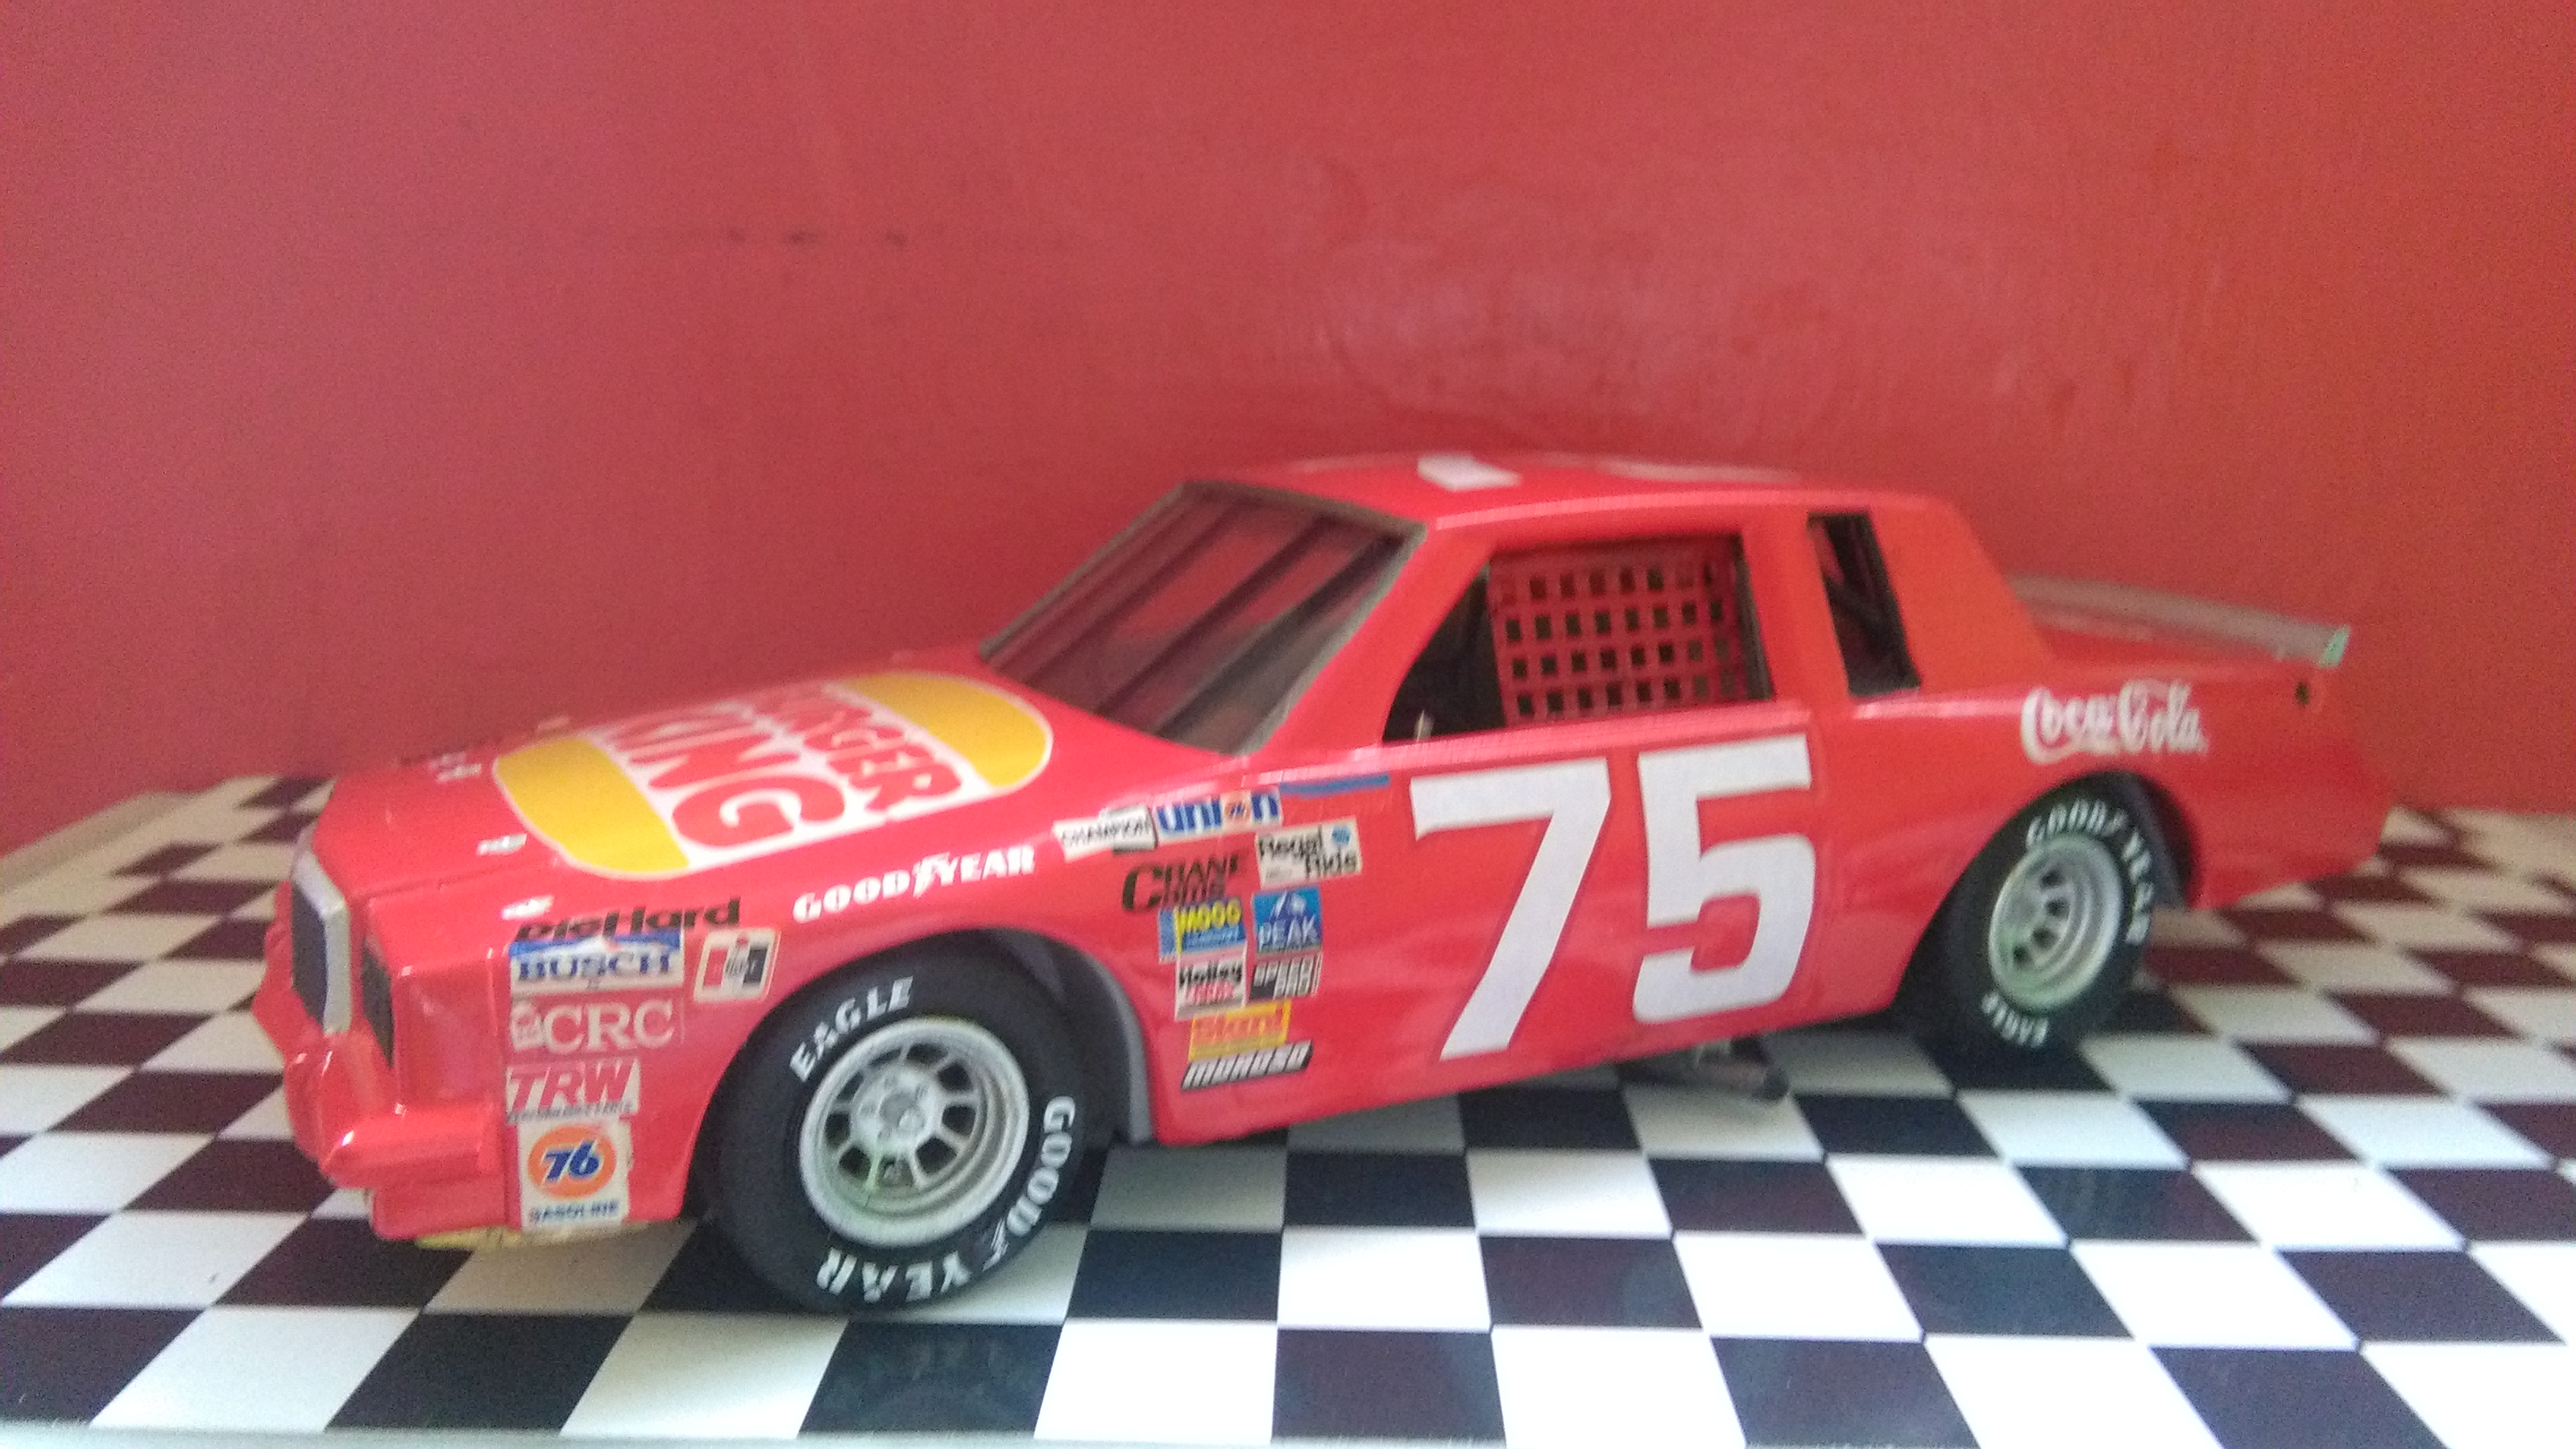 Pontiac Grand-Prix 1985 #75 Dave Marcis Coca-Cola (AMT 1/25) 750098IMG20170506154030